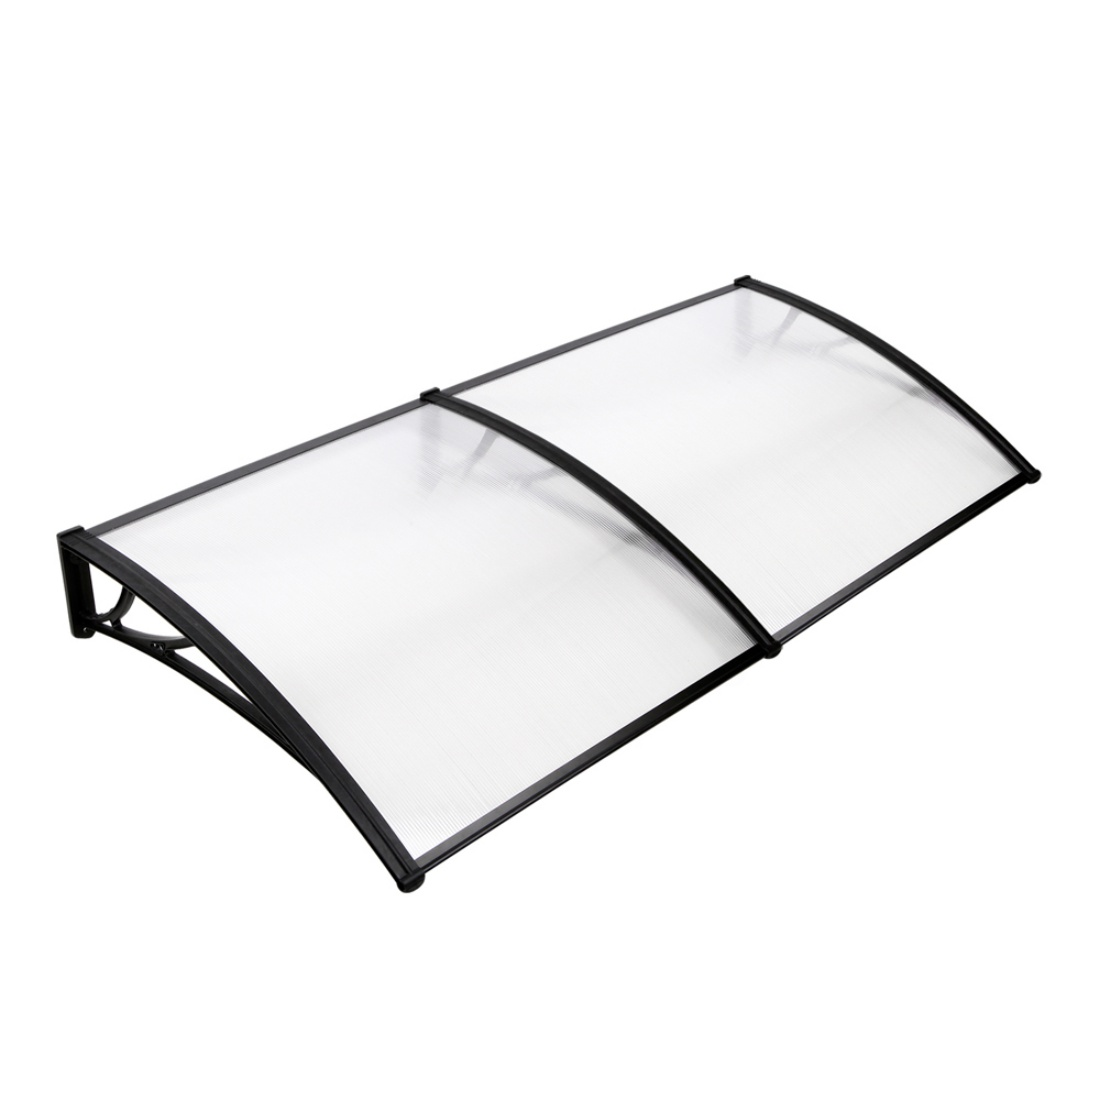 Window Door Awning DIY UV Sun Rain Outdoor Protection Cover 1m x 2m Transparent